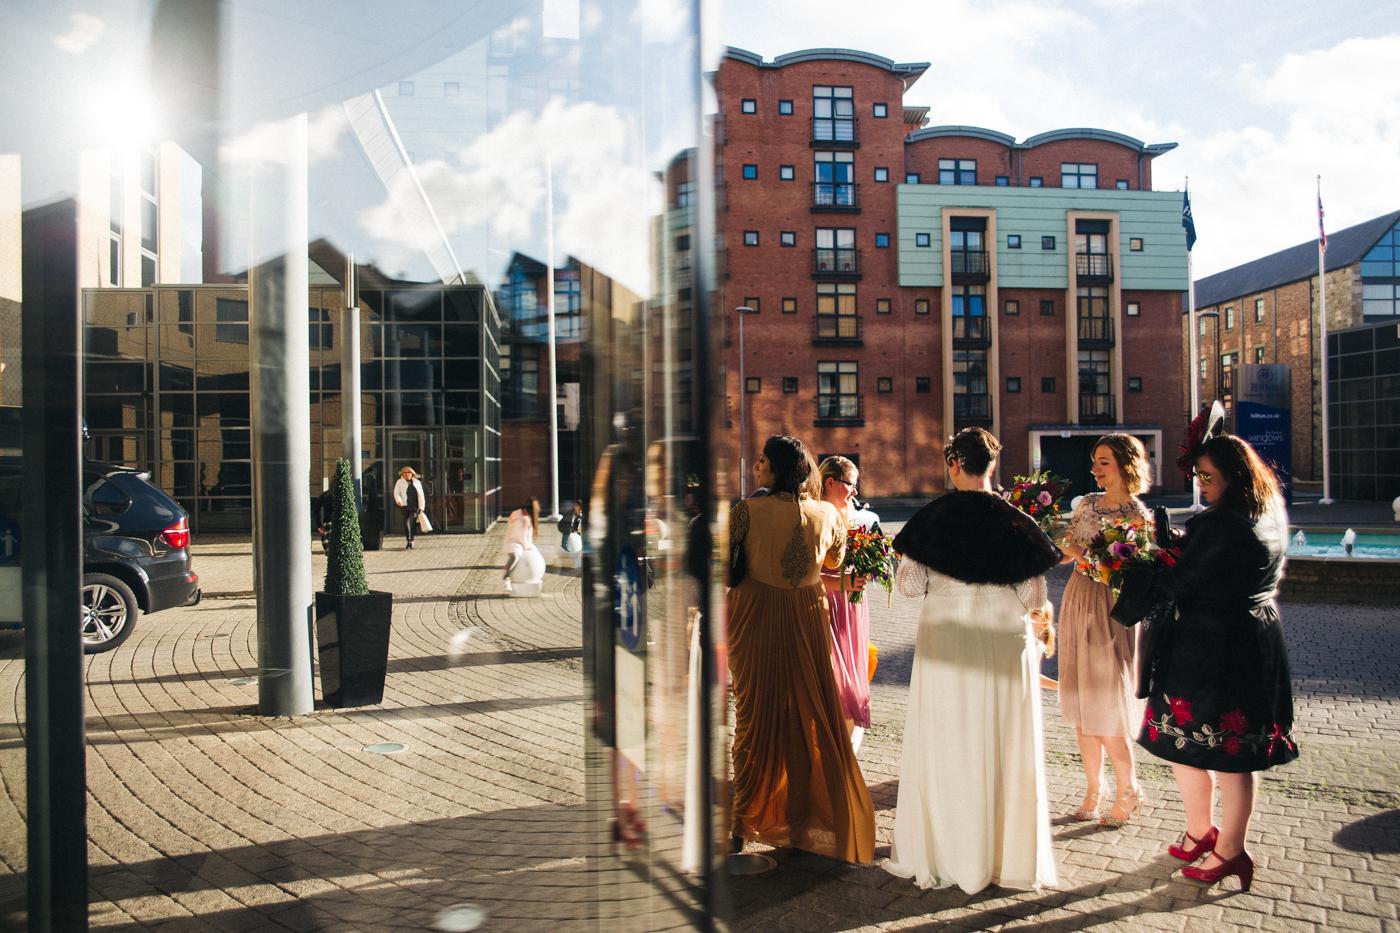 teesside-newcastle-gateshead-wedding-photography-photographer-creative-0024.jpg